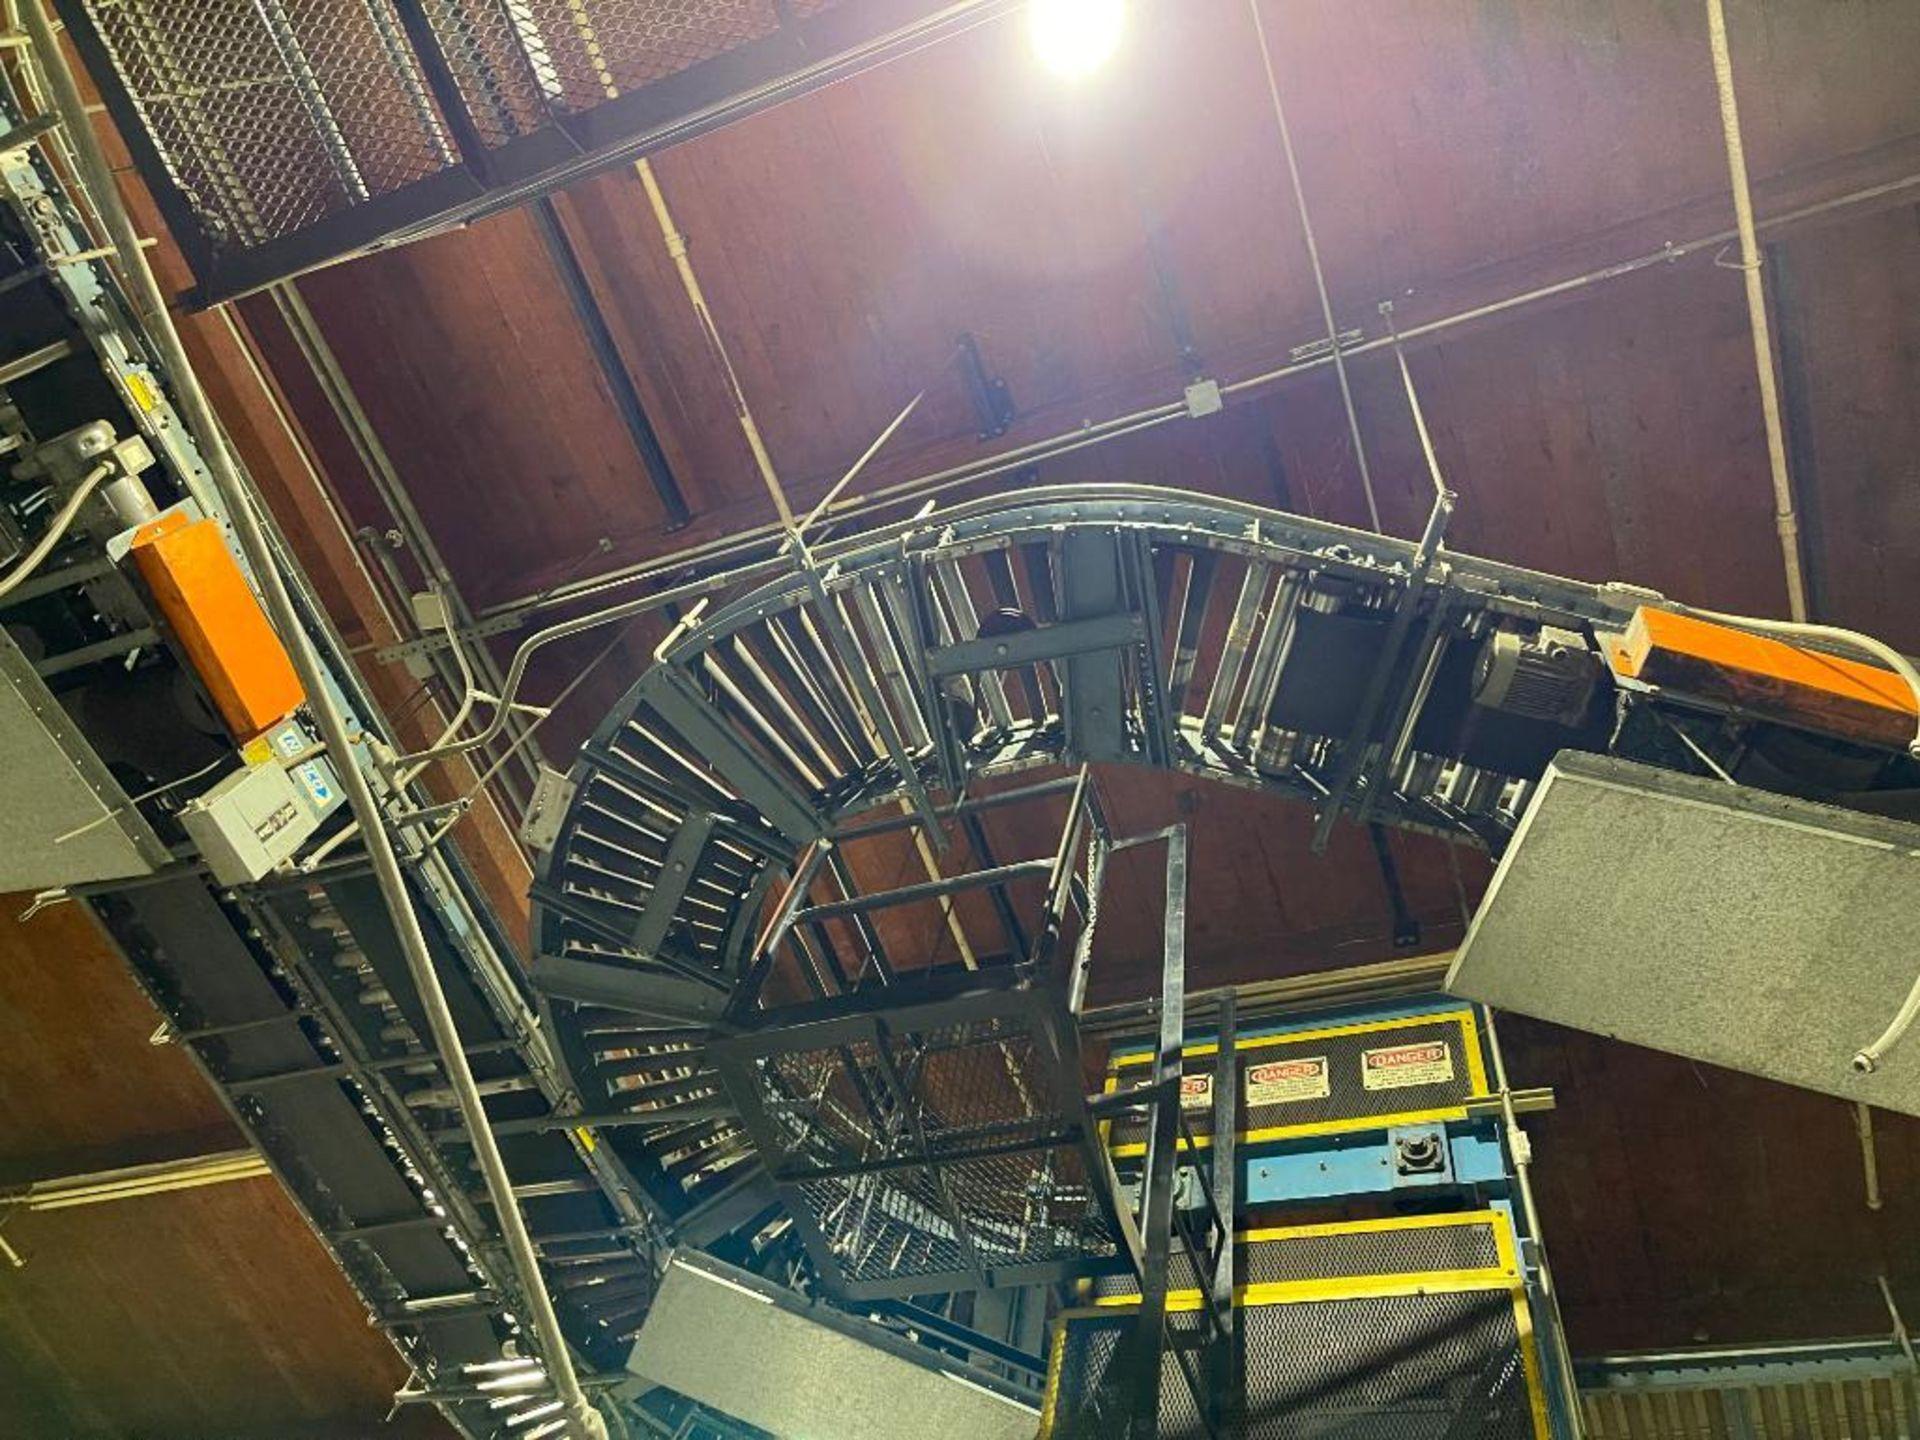 overhead power case conveyor - Image 6 of 9